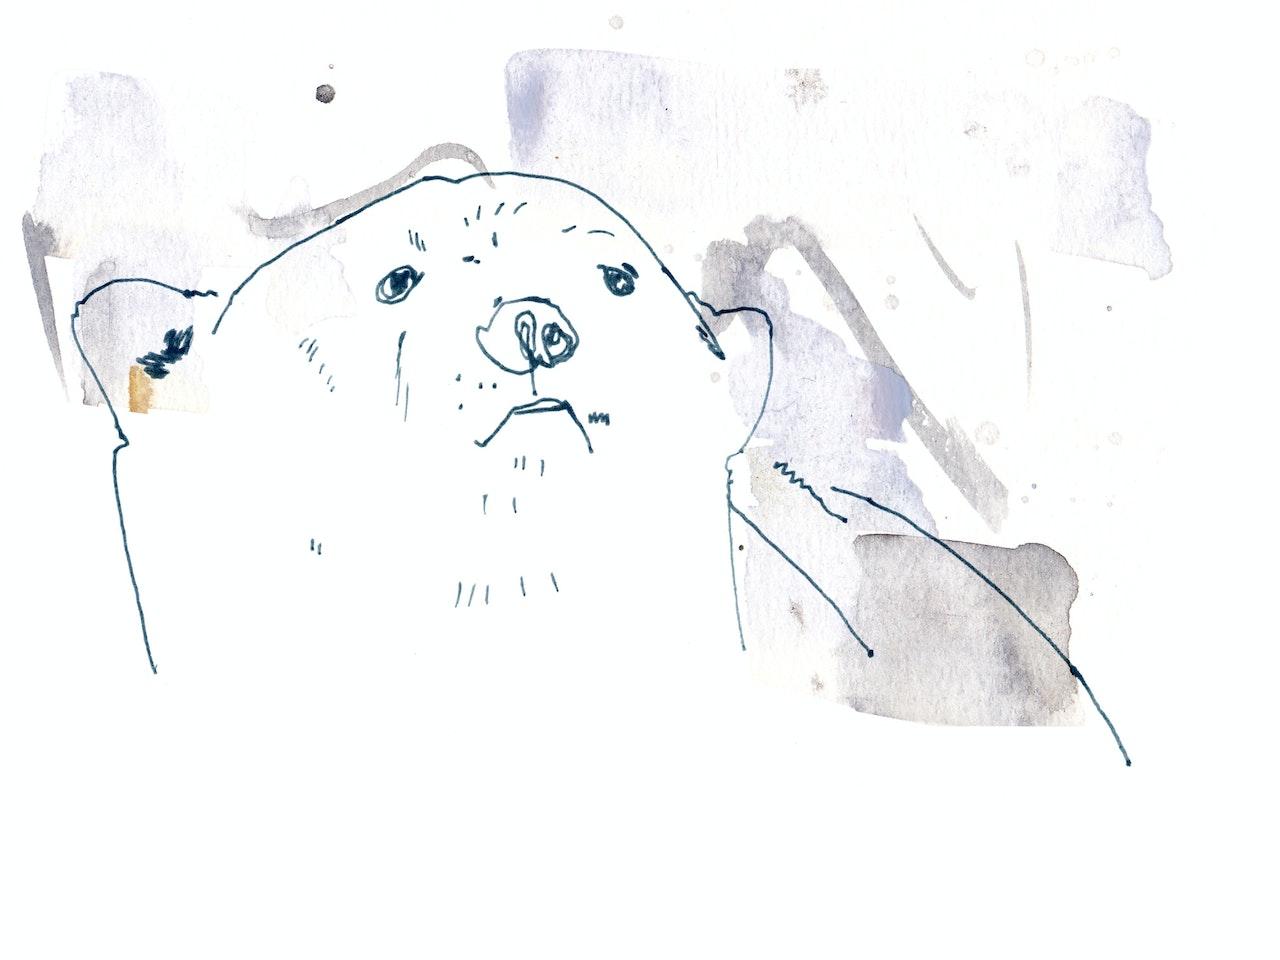 Vicky Bentham Green 16.01.15 Polar Bear2 Unpublished